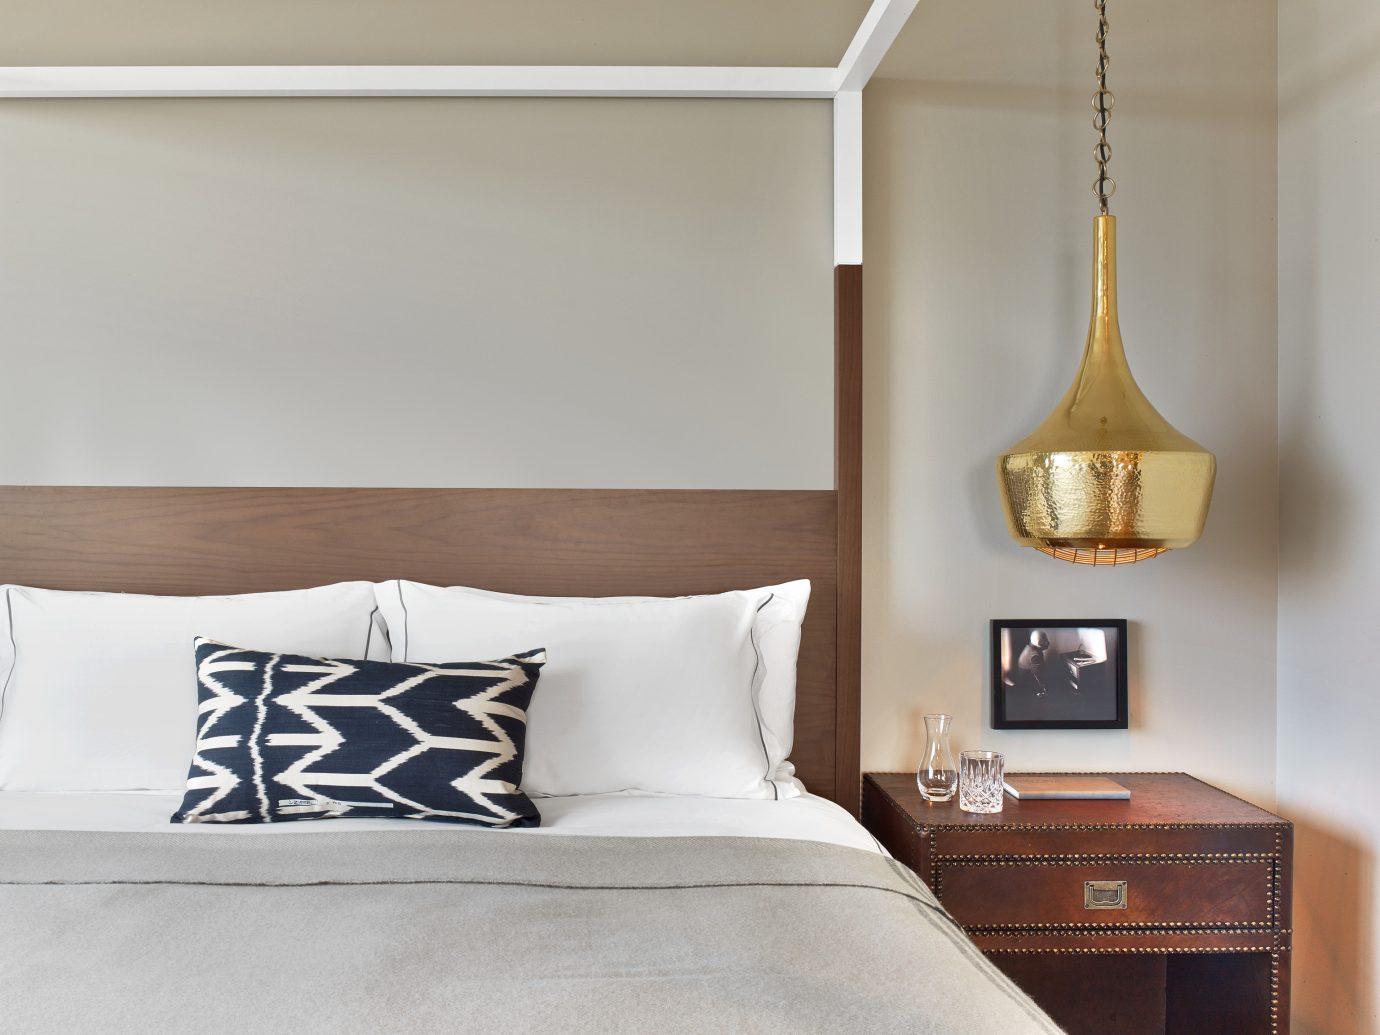 Hotels wall indoor bed room Bedroom furniture interior design bed sheet floor bed frame duvet cover pillow living room textile window covering